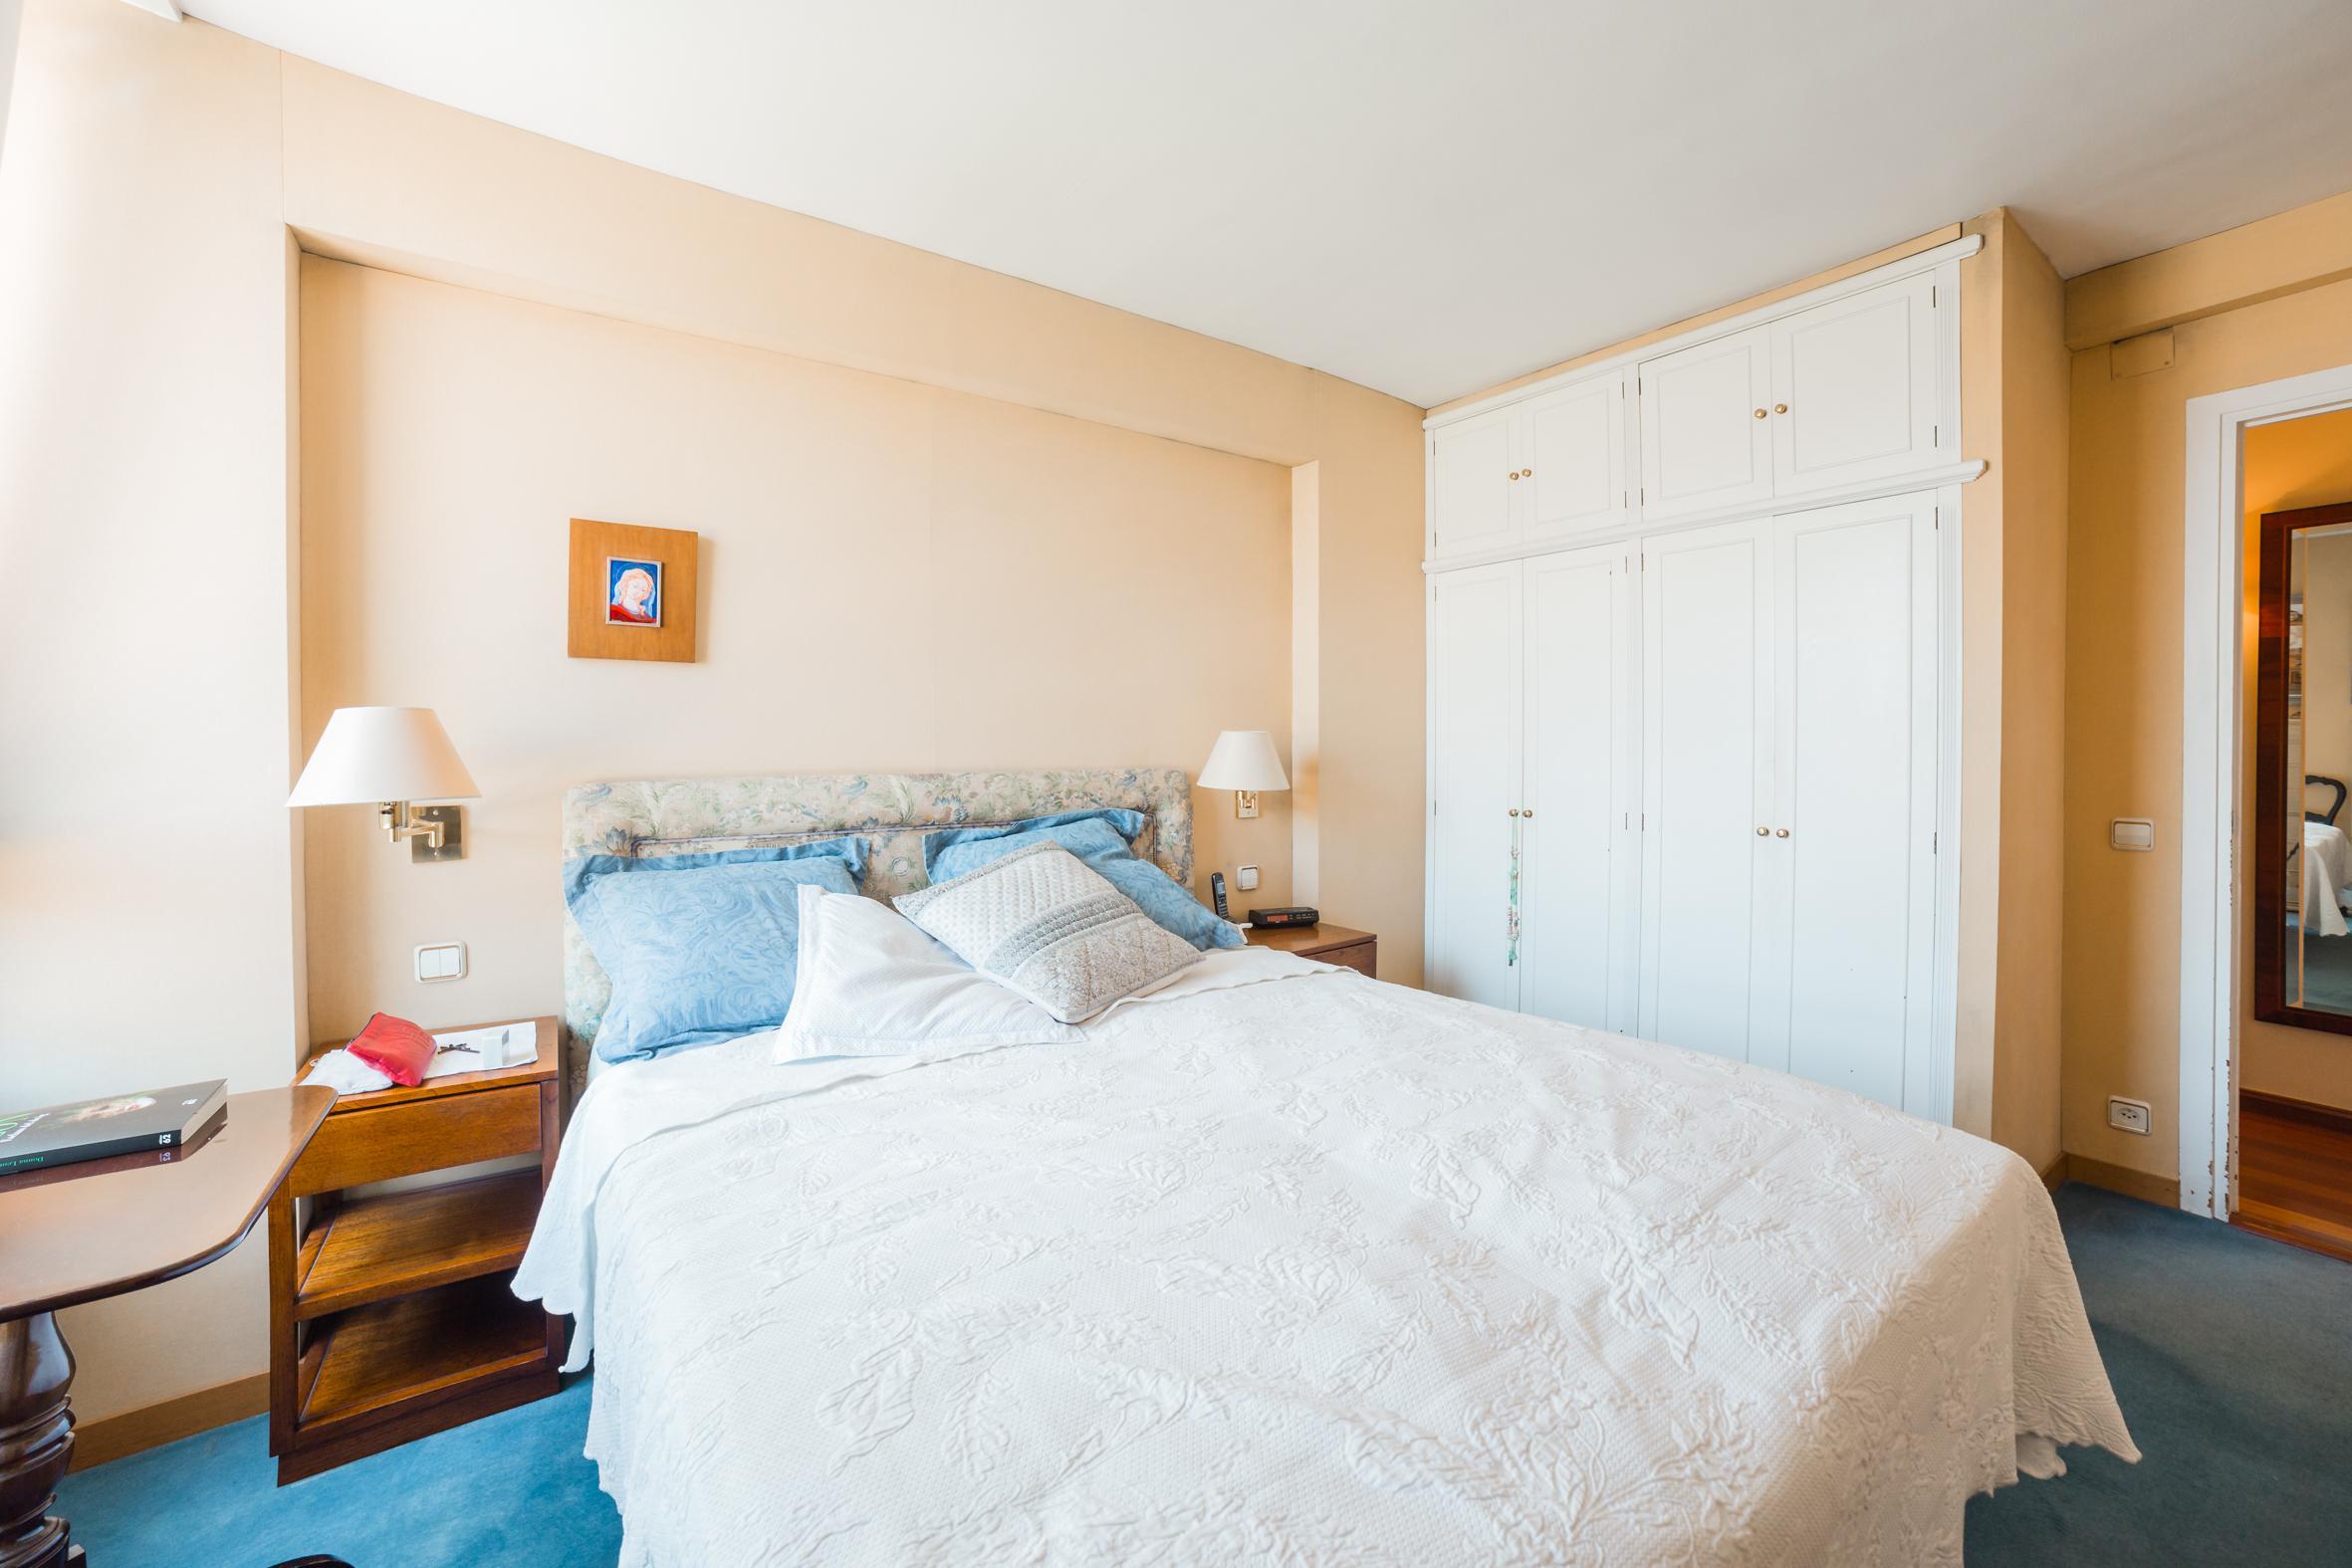 253515 Apartamento en venta en Sarrià-Sant Gervasi, Sant Gervasi-Galvany 4